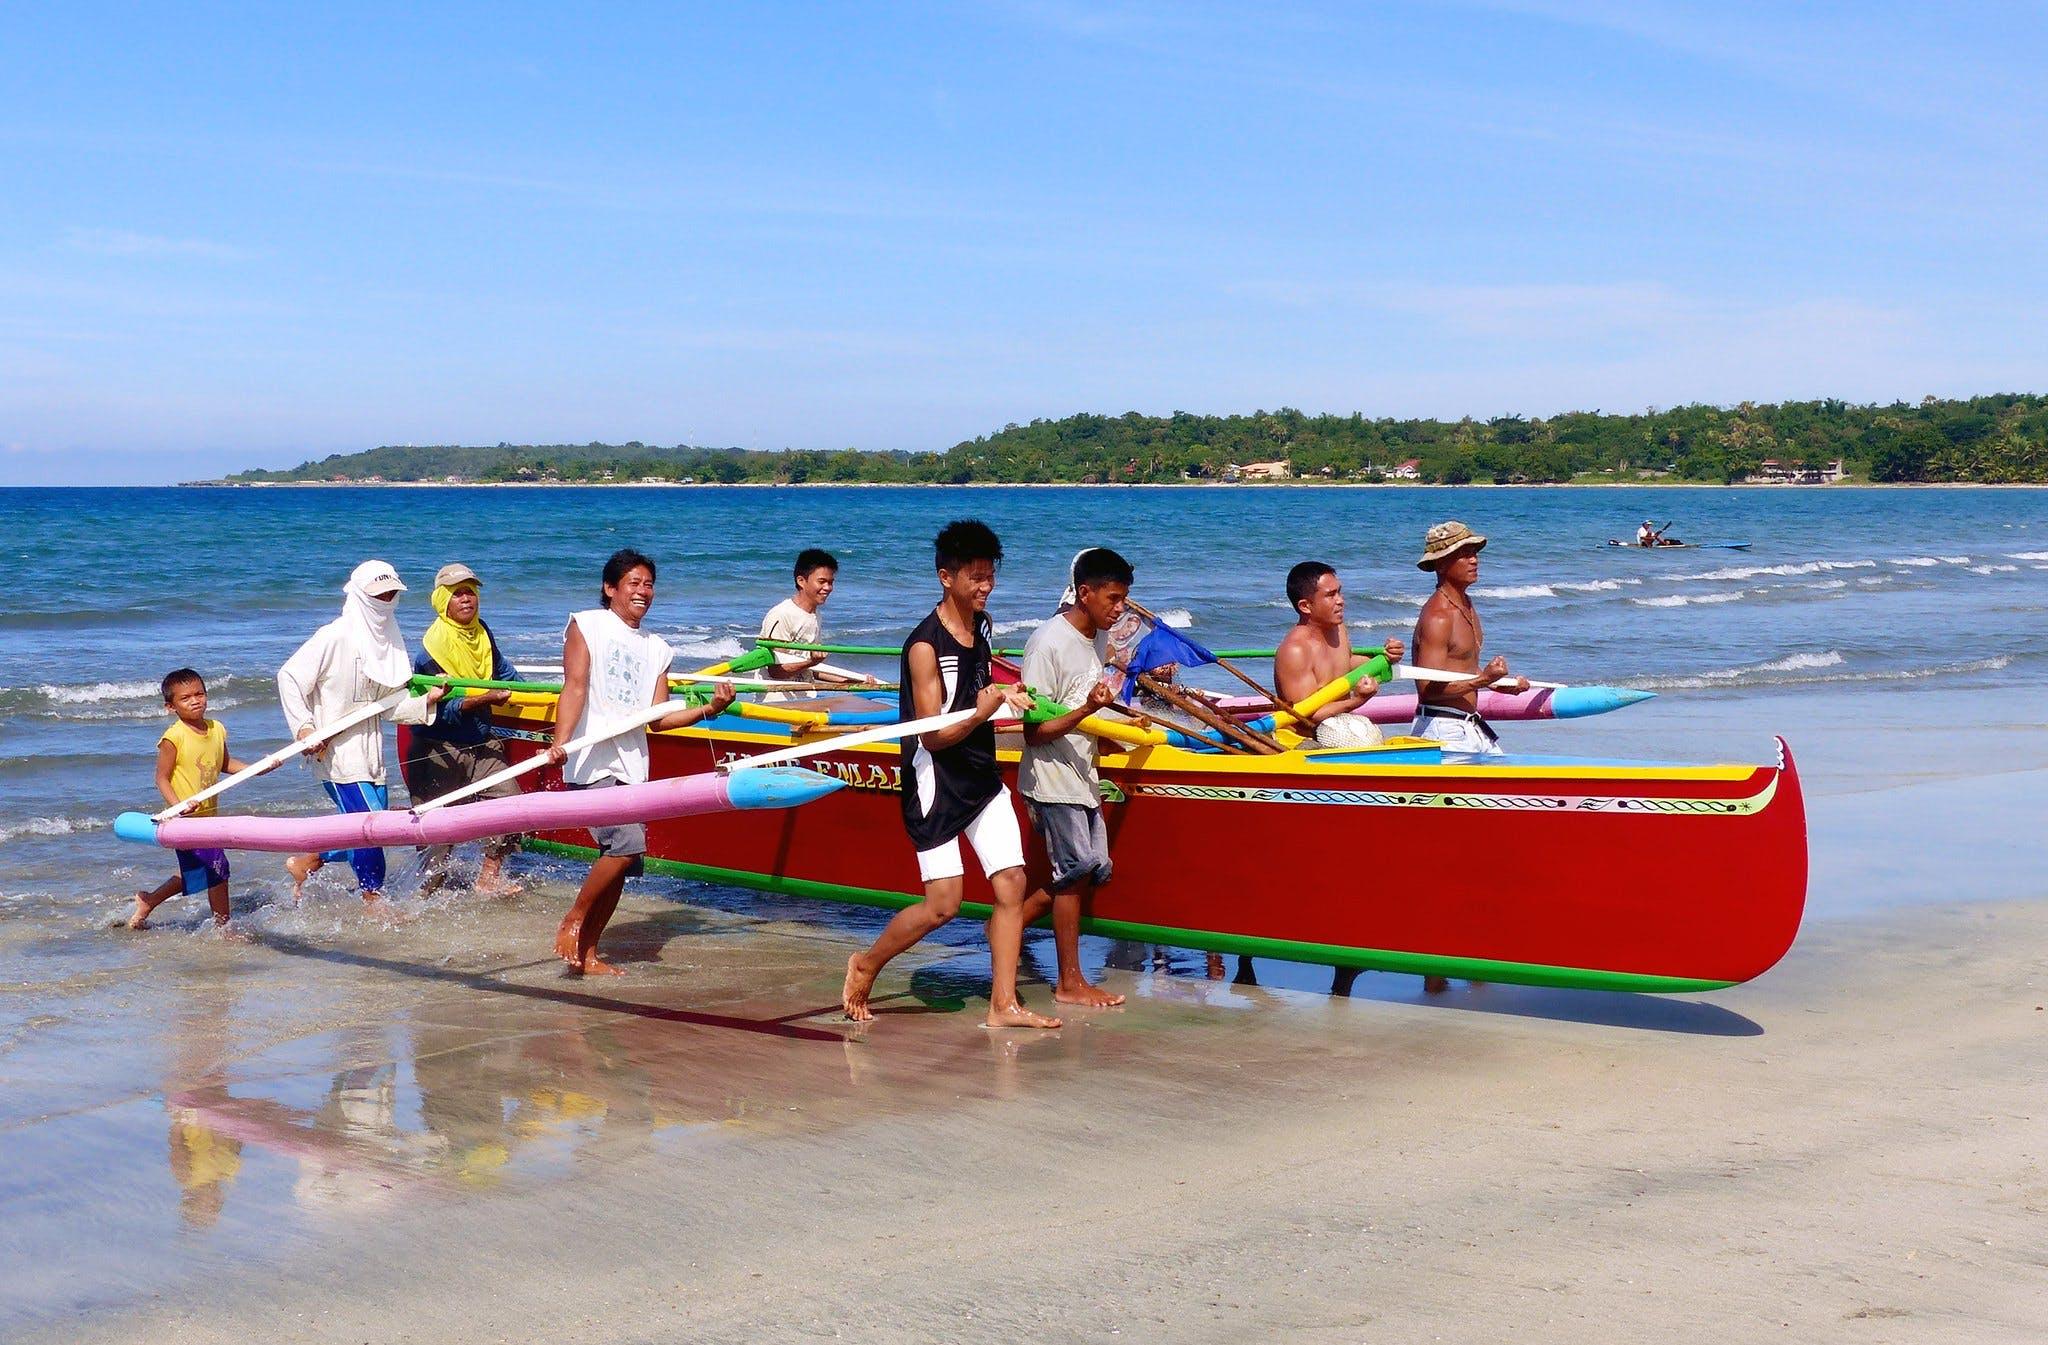 Fishers in Currimao Beach, Ilocos Norte, Philippines, hauling their boat ashore